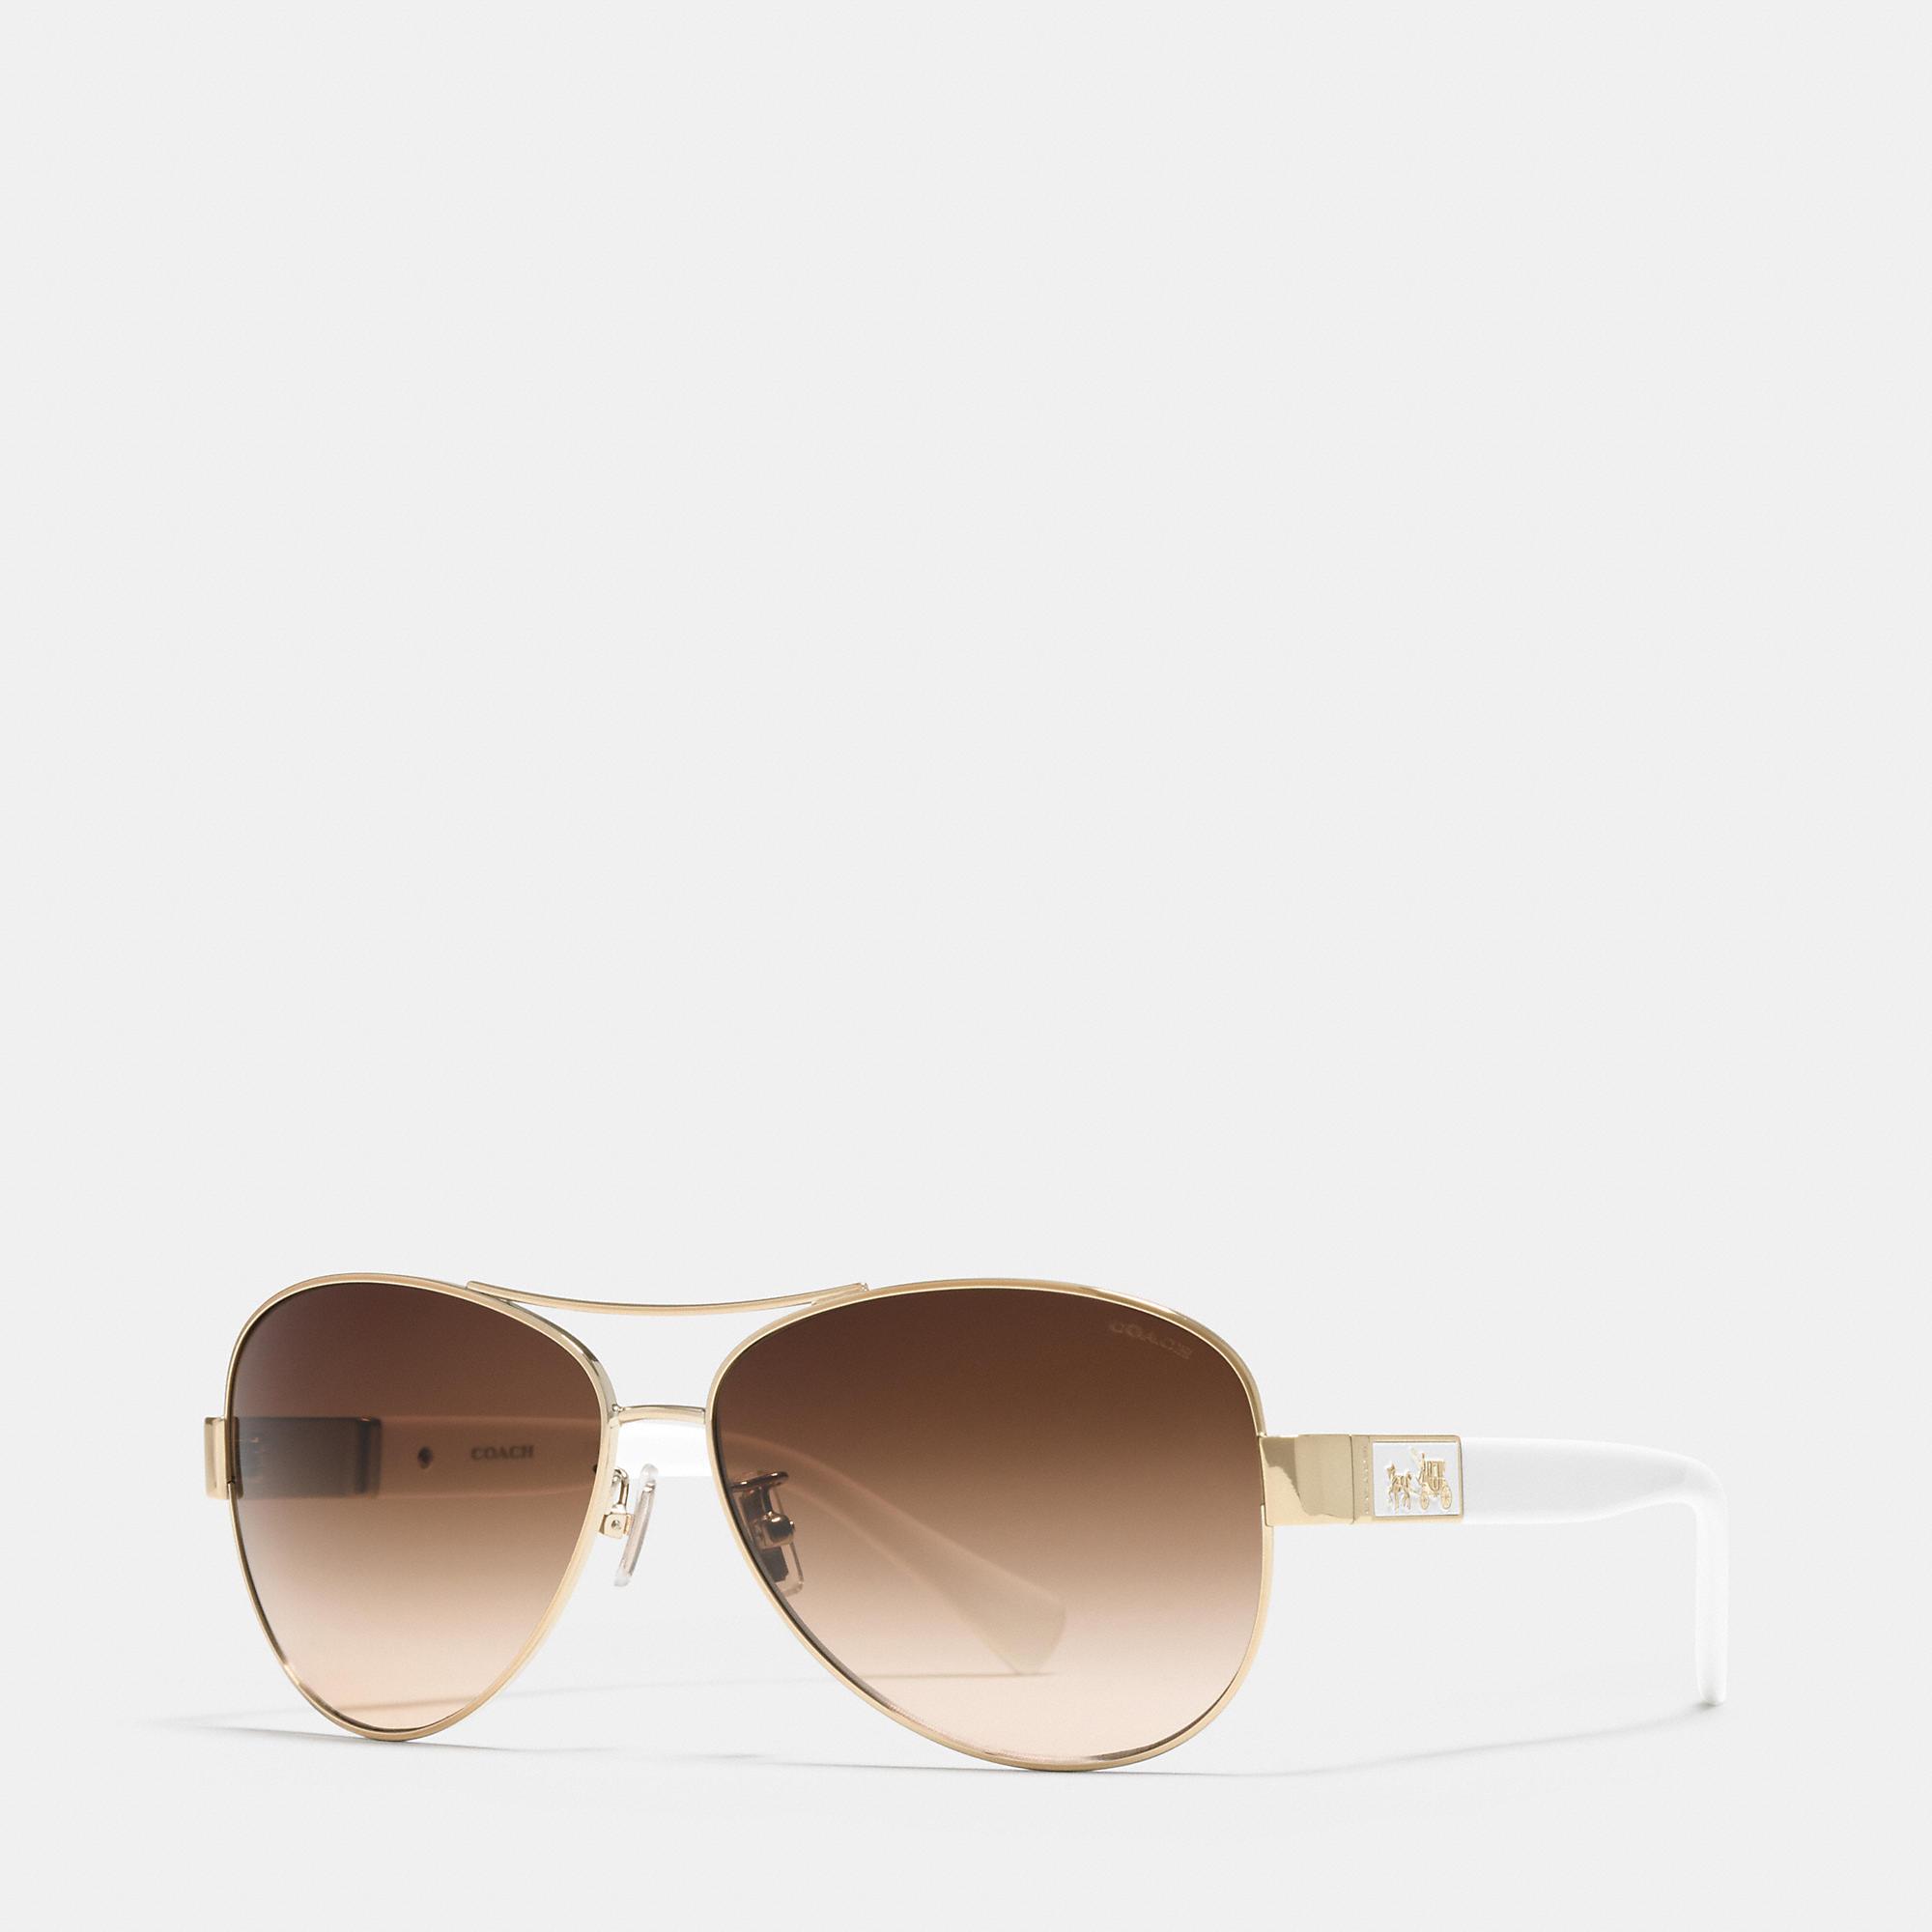 4f30909069 ... gold red brown gradient 59 13 135 1f25f a6ef2  reduced lyst coach  christina sunglasses in metallic 0ecf4 45e4f